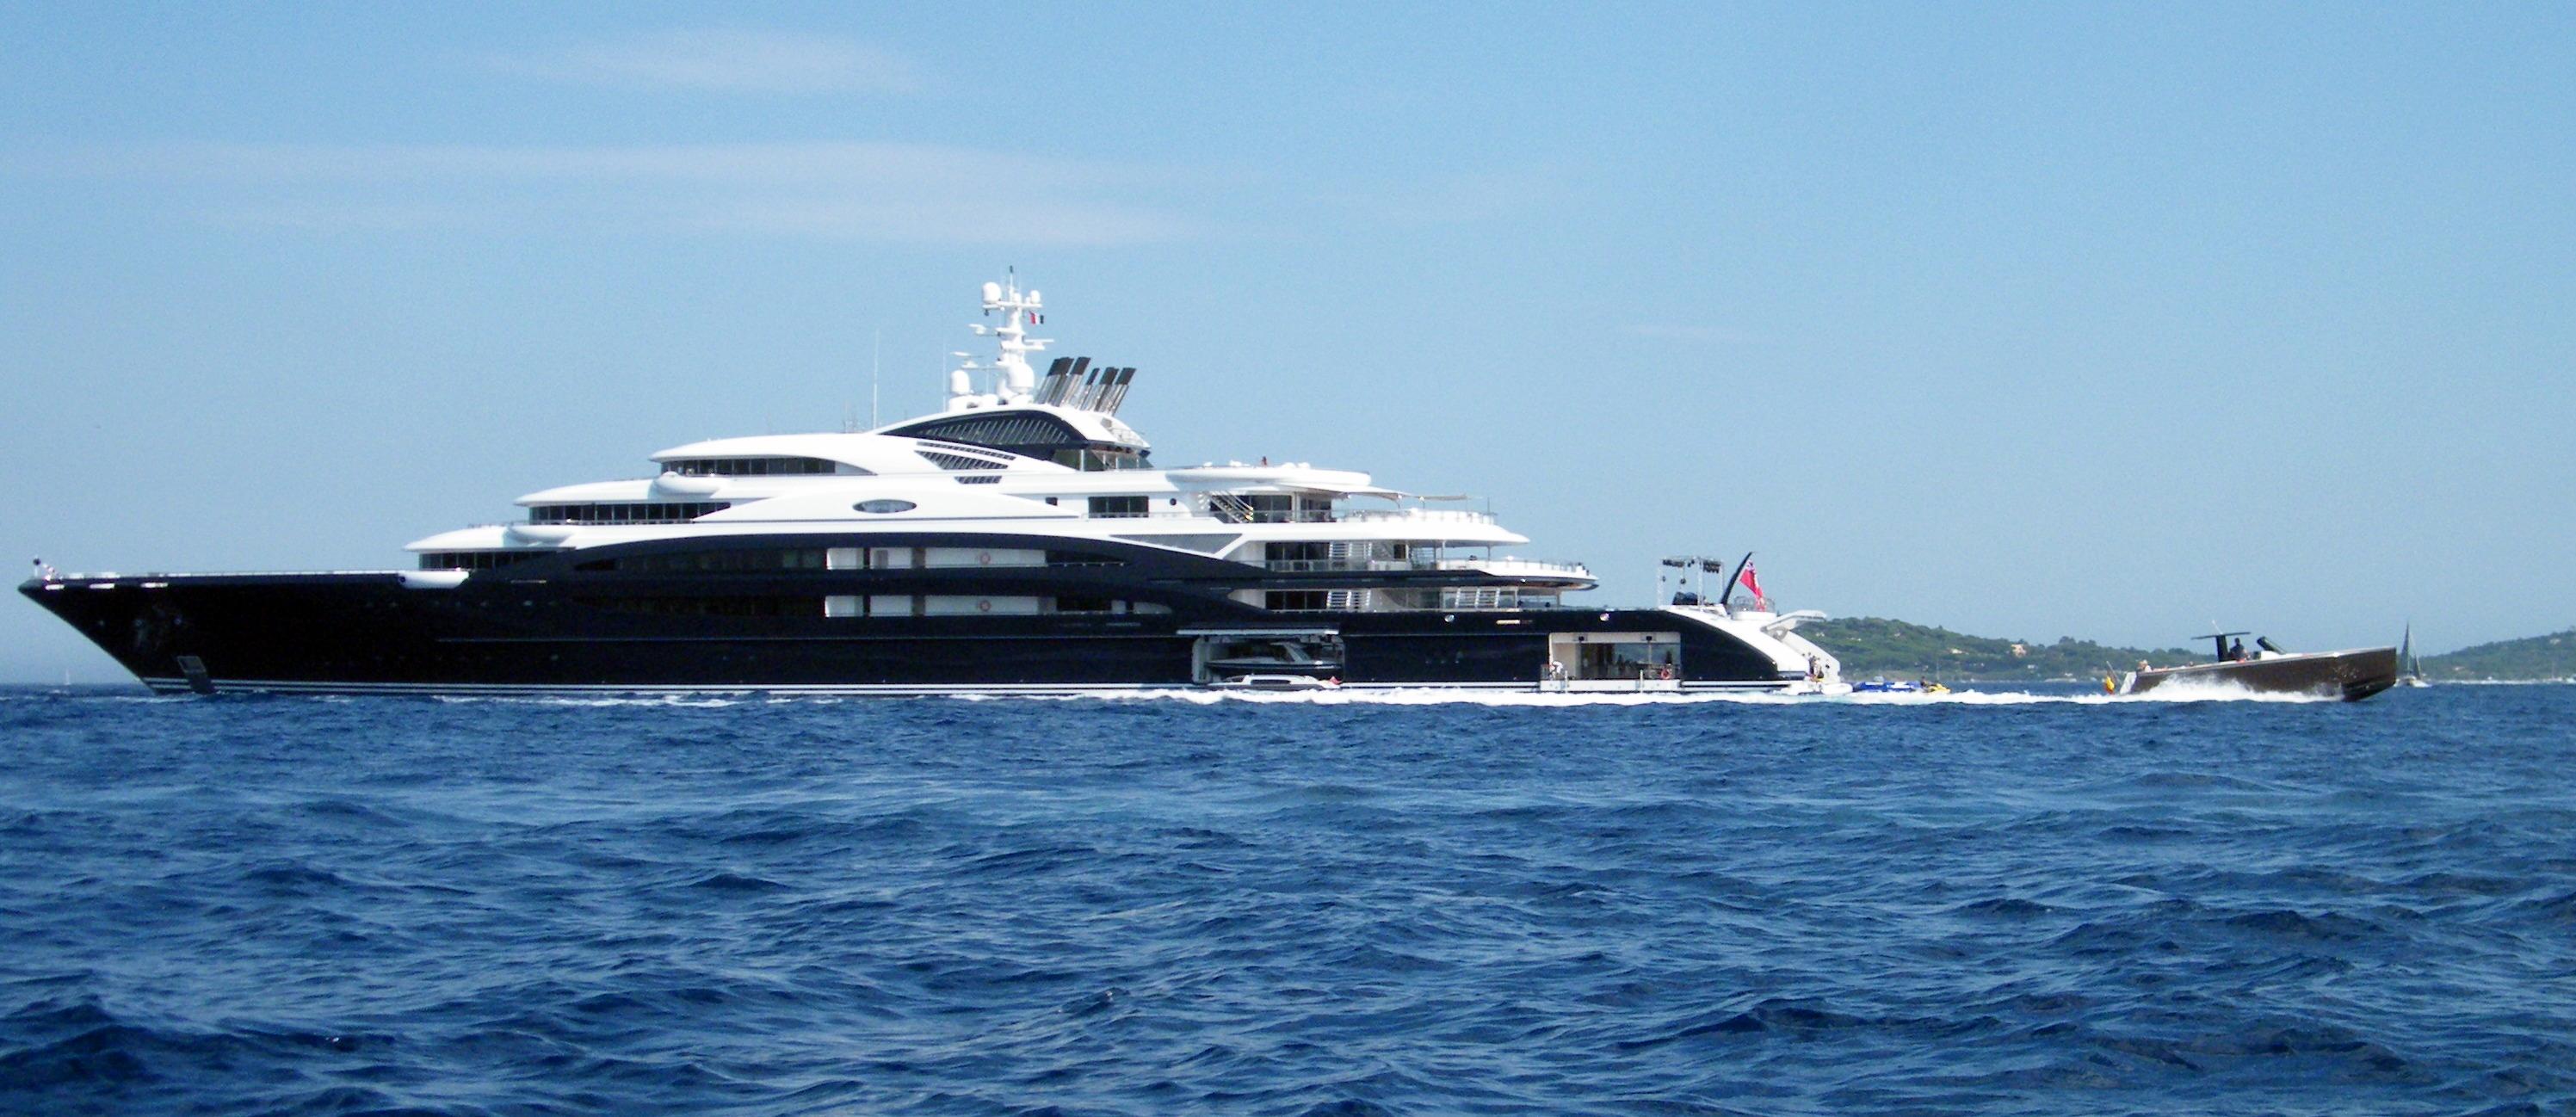 Luxury yacht Serene